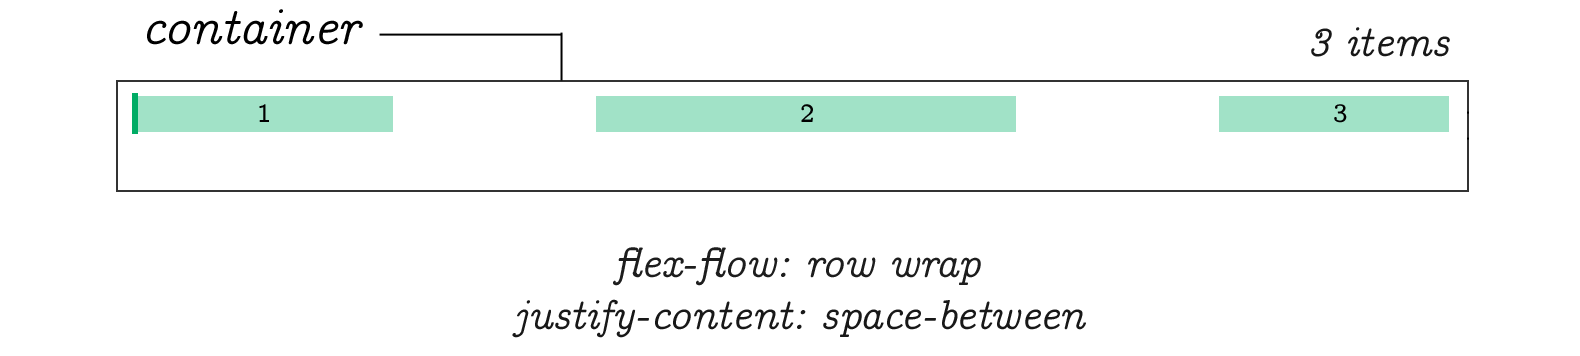 Flex Flow Row Wrap Justify Conten Space Between